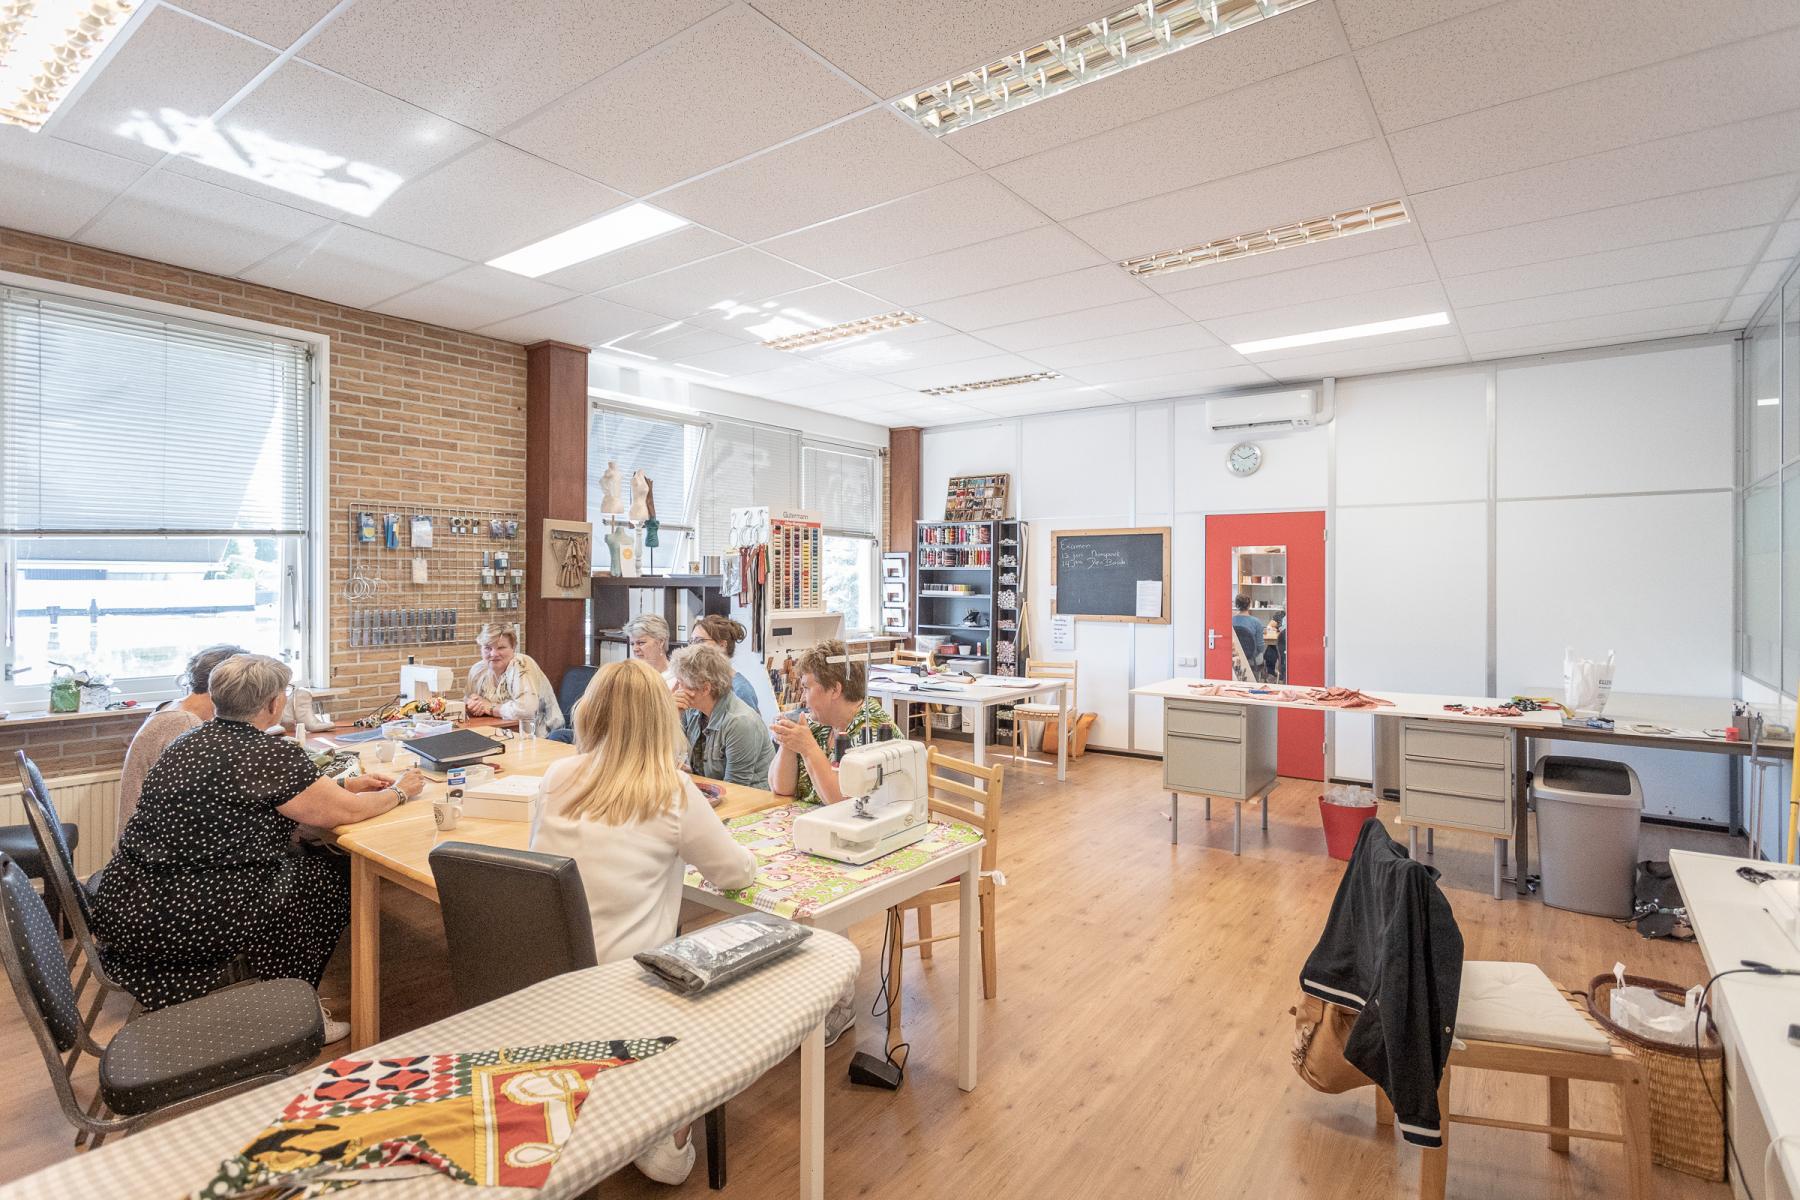 kantoorkamer kantoorruimte werkplek kantoorpand Hengelo industrieterrein goed bereikbaar gratis parkeren ingerichte kantoorruimte vergaderruimte receptie